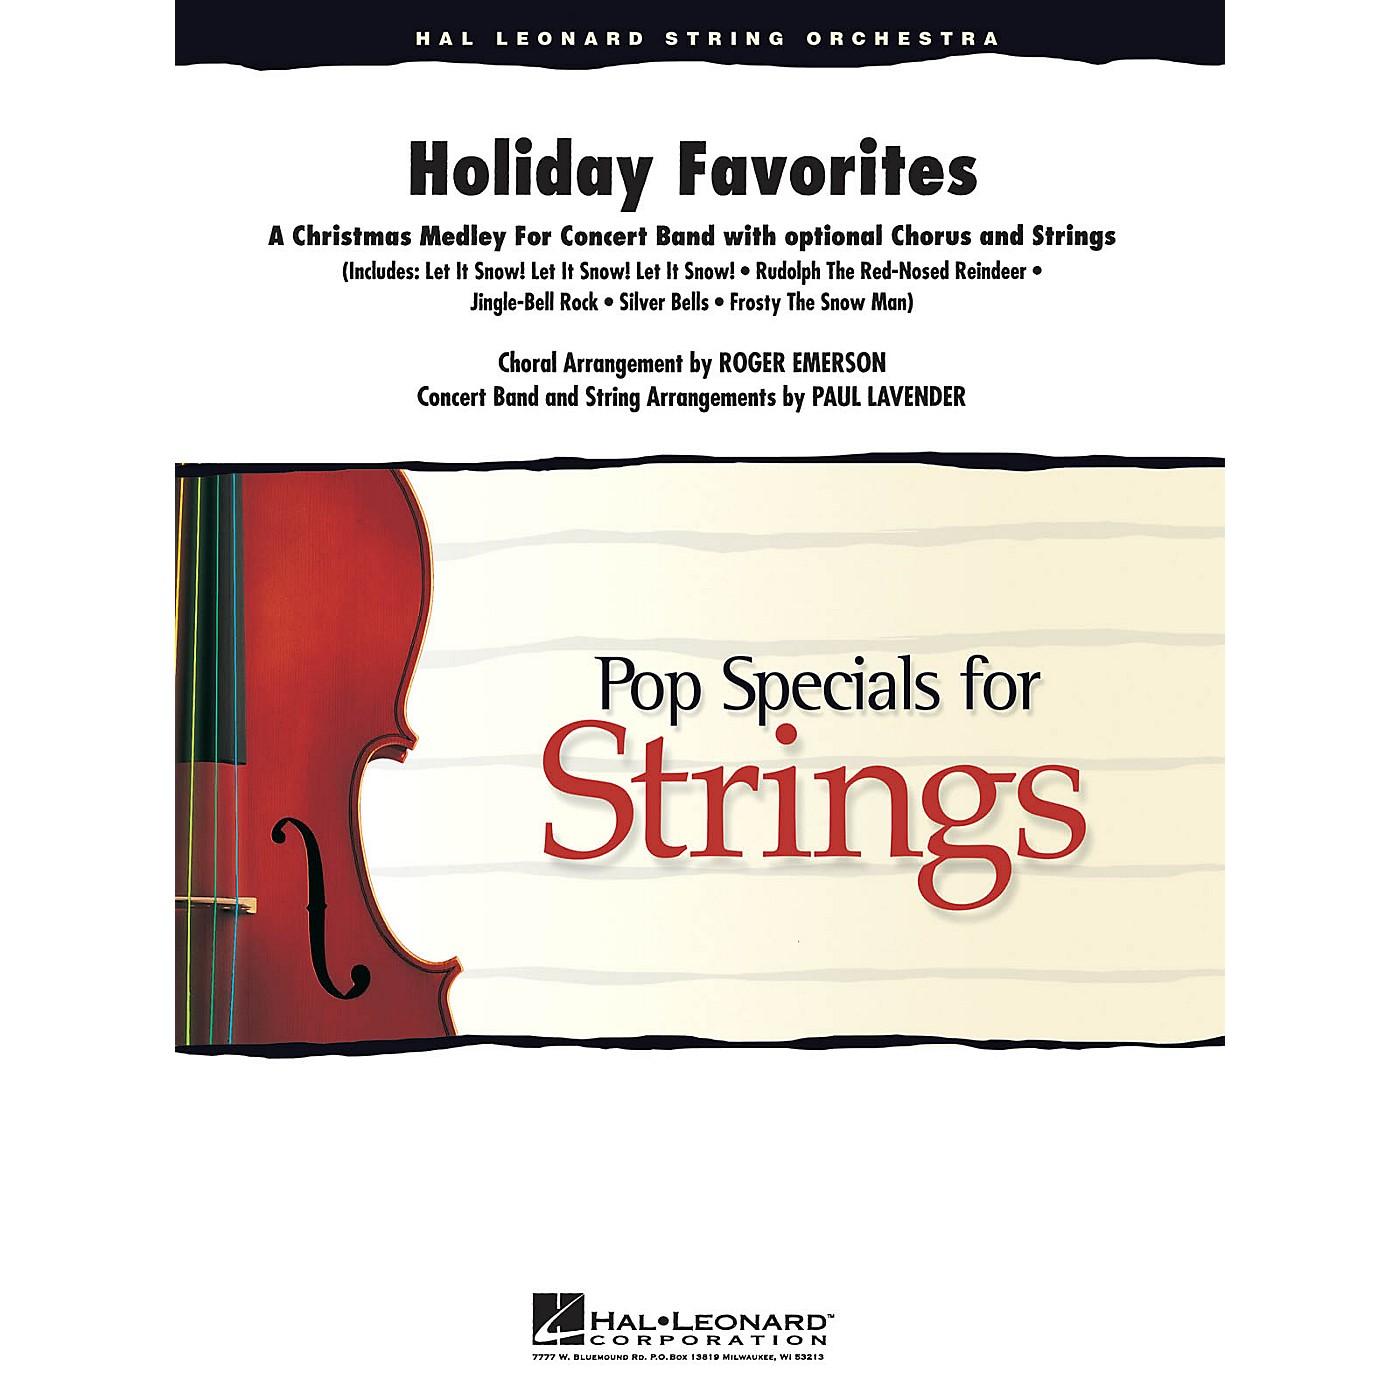 Hal Leonard Holiday Favorites (Medley) Score & Parts Arranged by Paul Lavender thumbnail